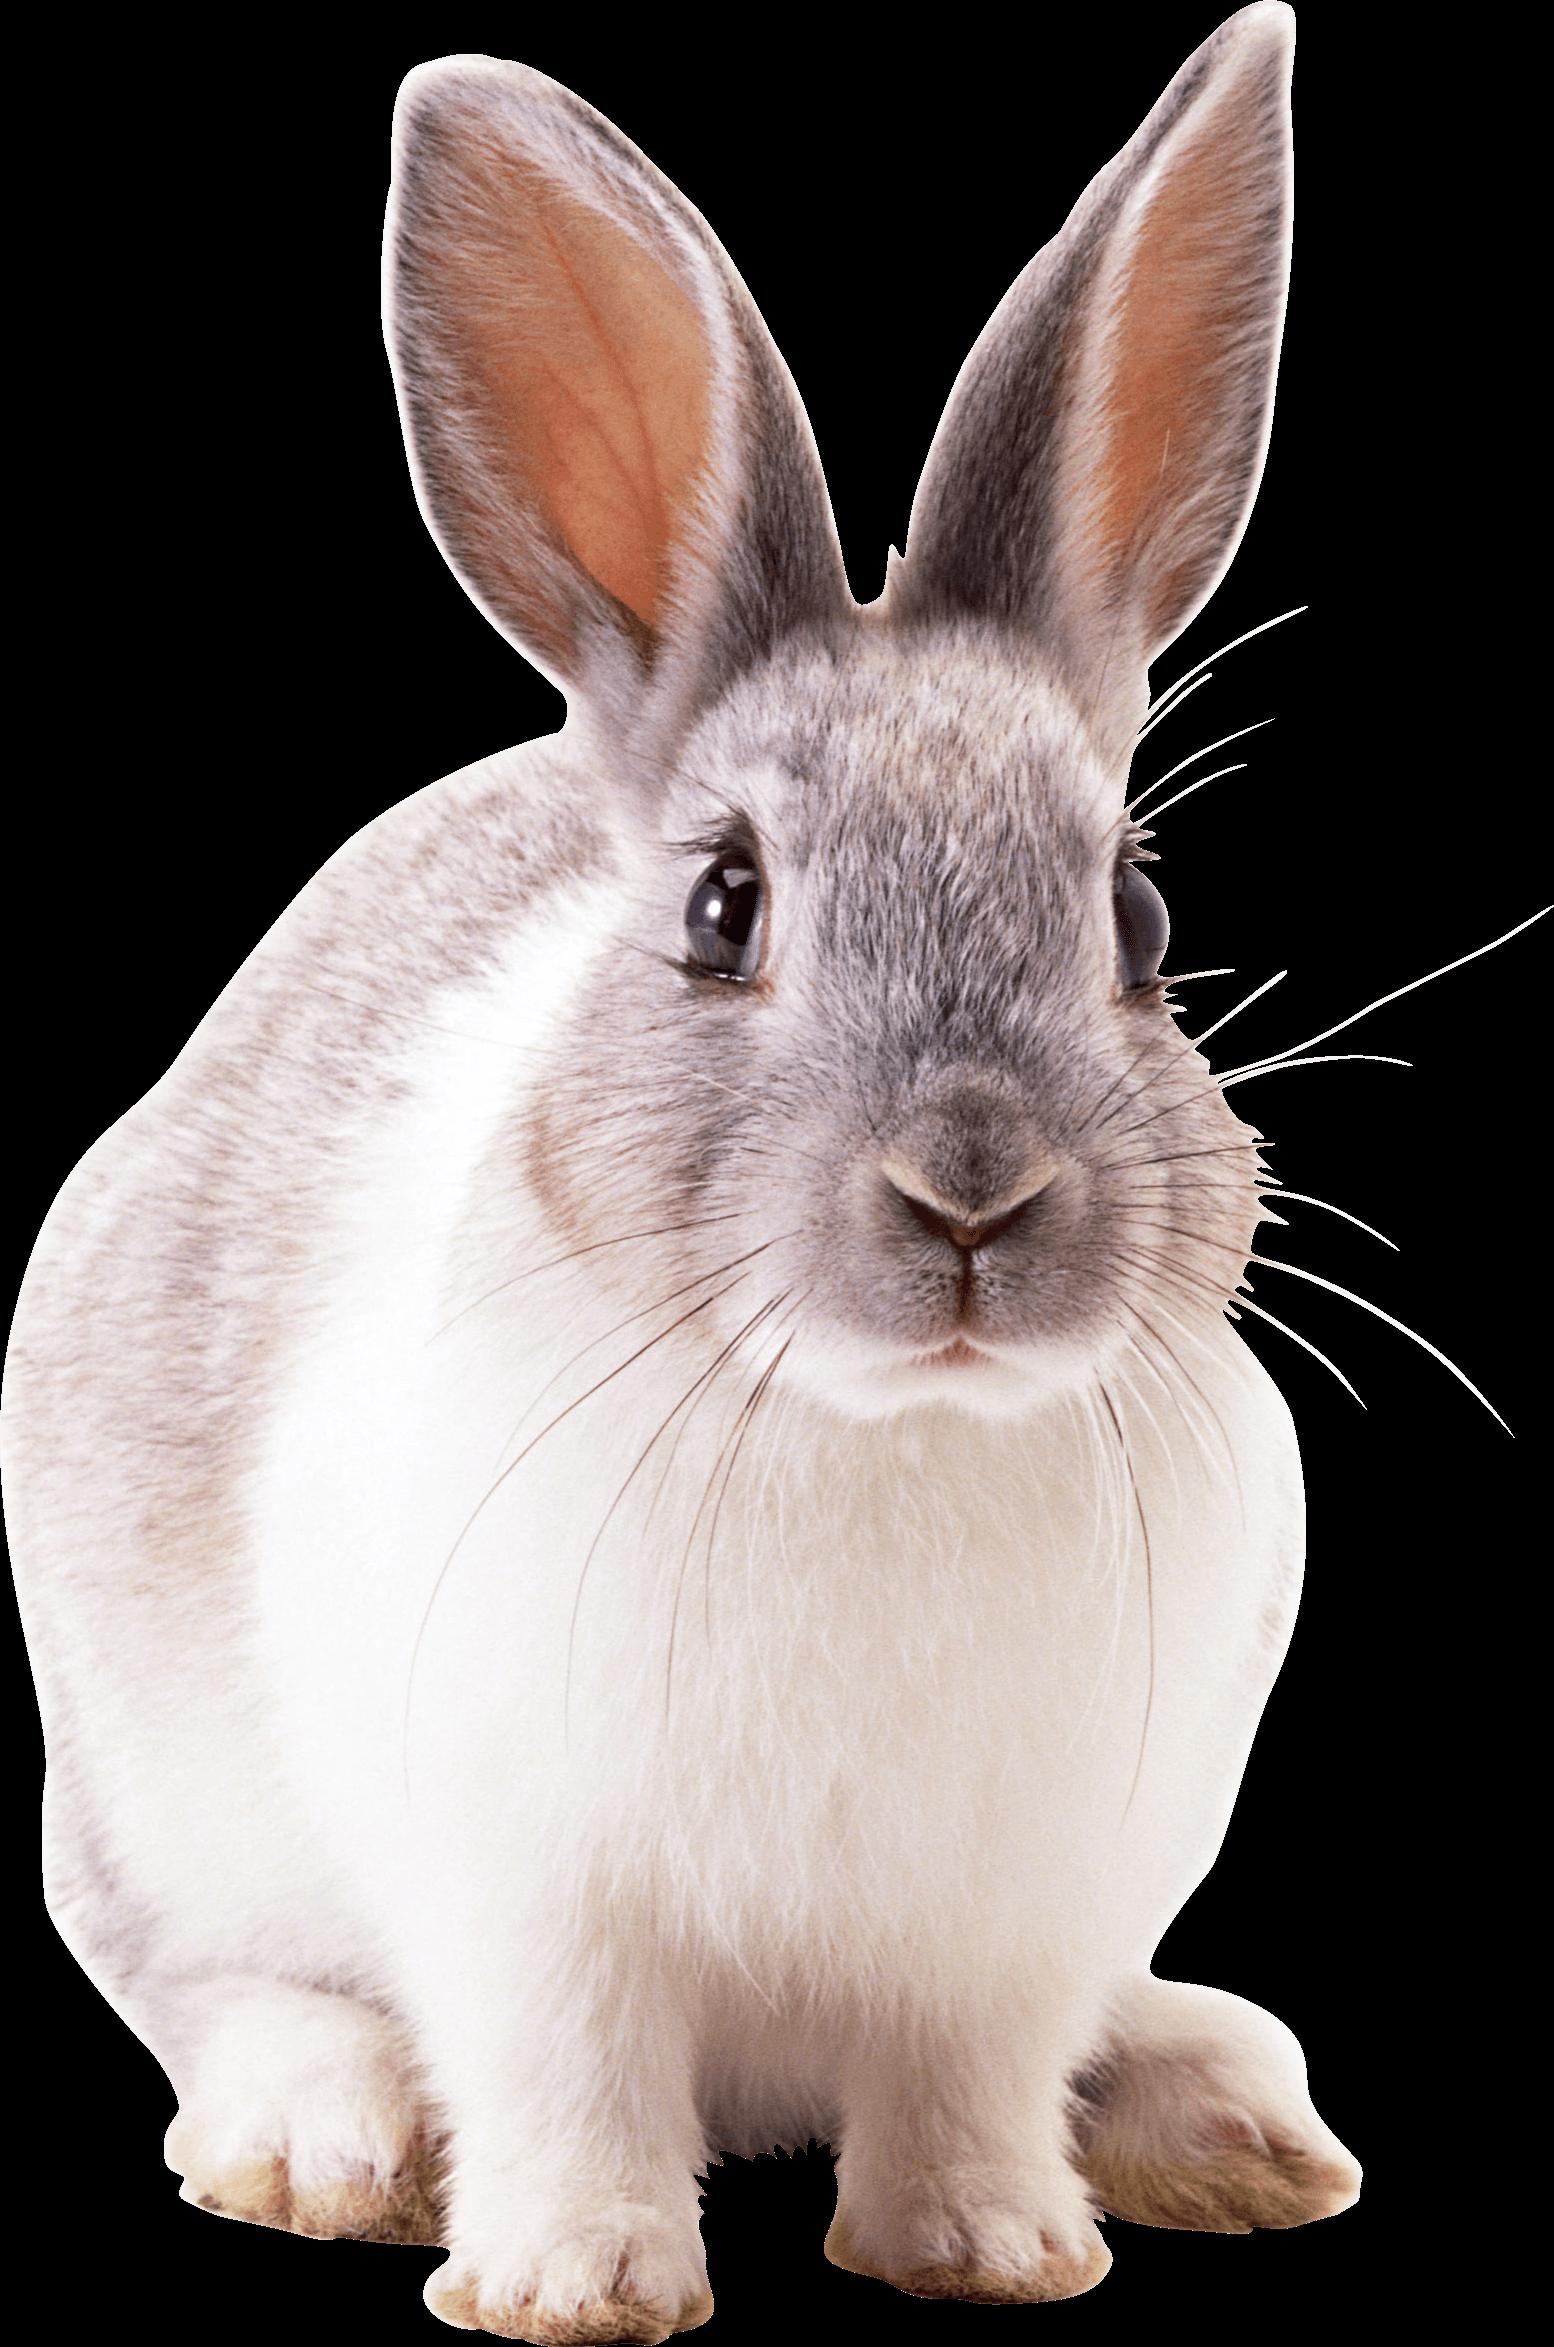 grey rabbit PNG Image